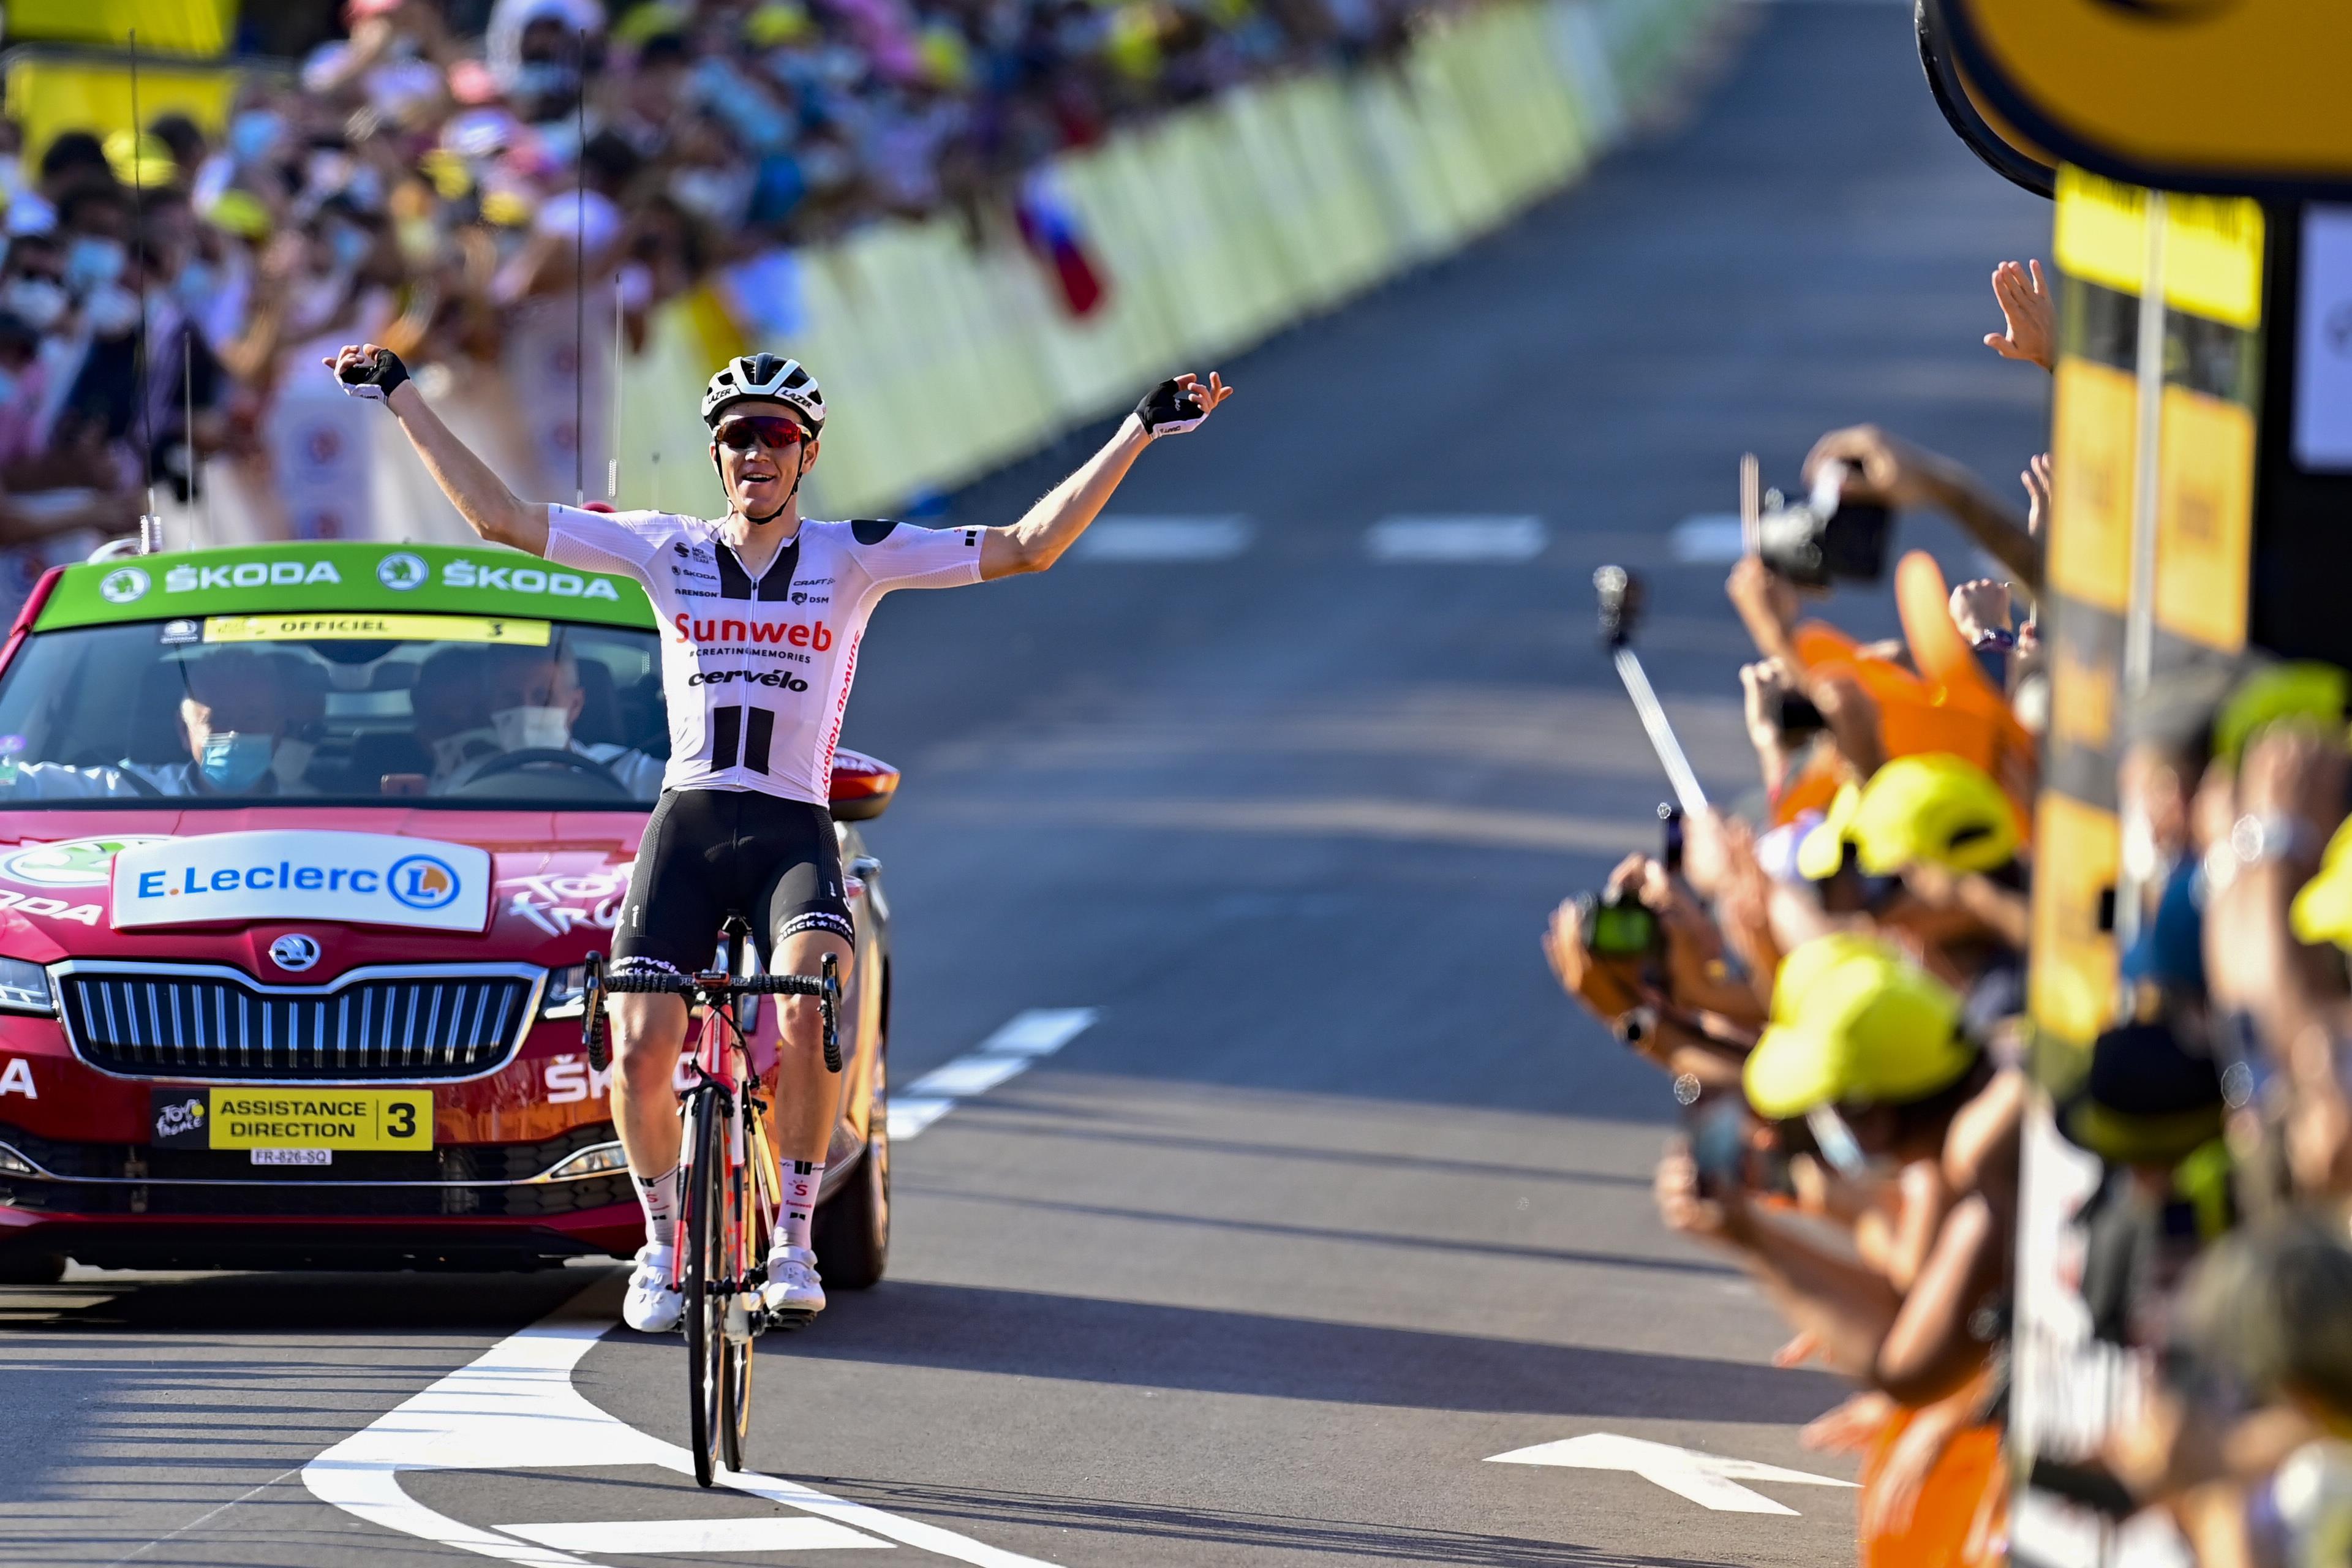 Soren Kragh Andersen ganó la decimonovena etapa del Tour de Francia 2020.